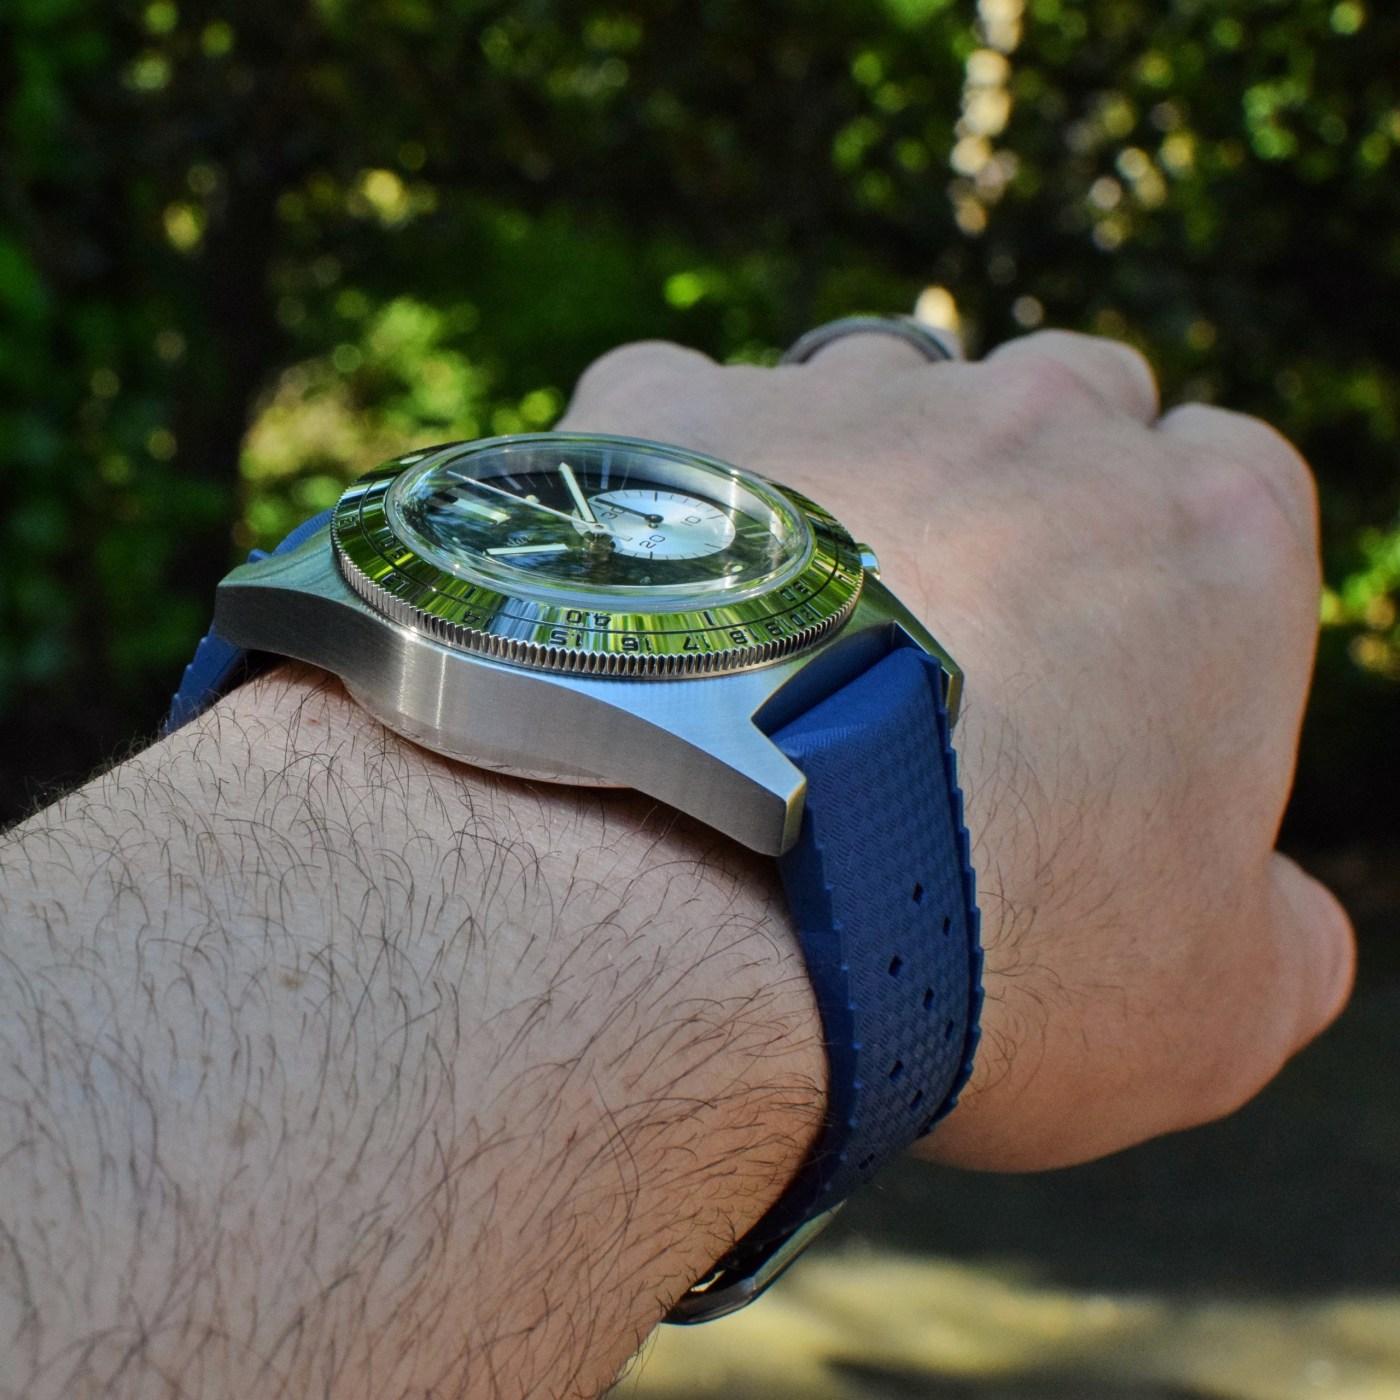 Aquastar Deepstar 2020 Re-Edition wristshot